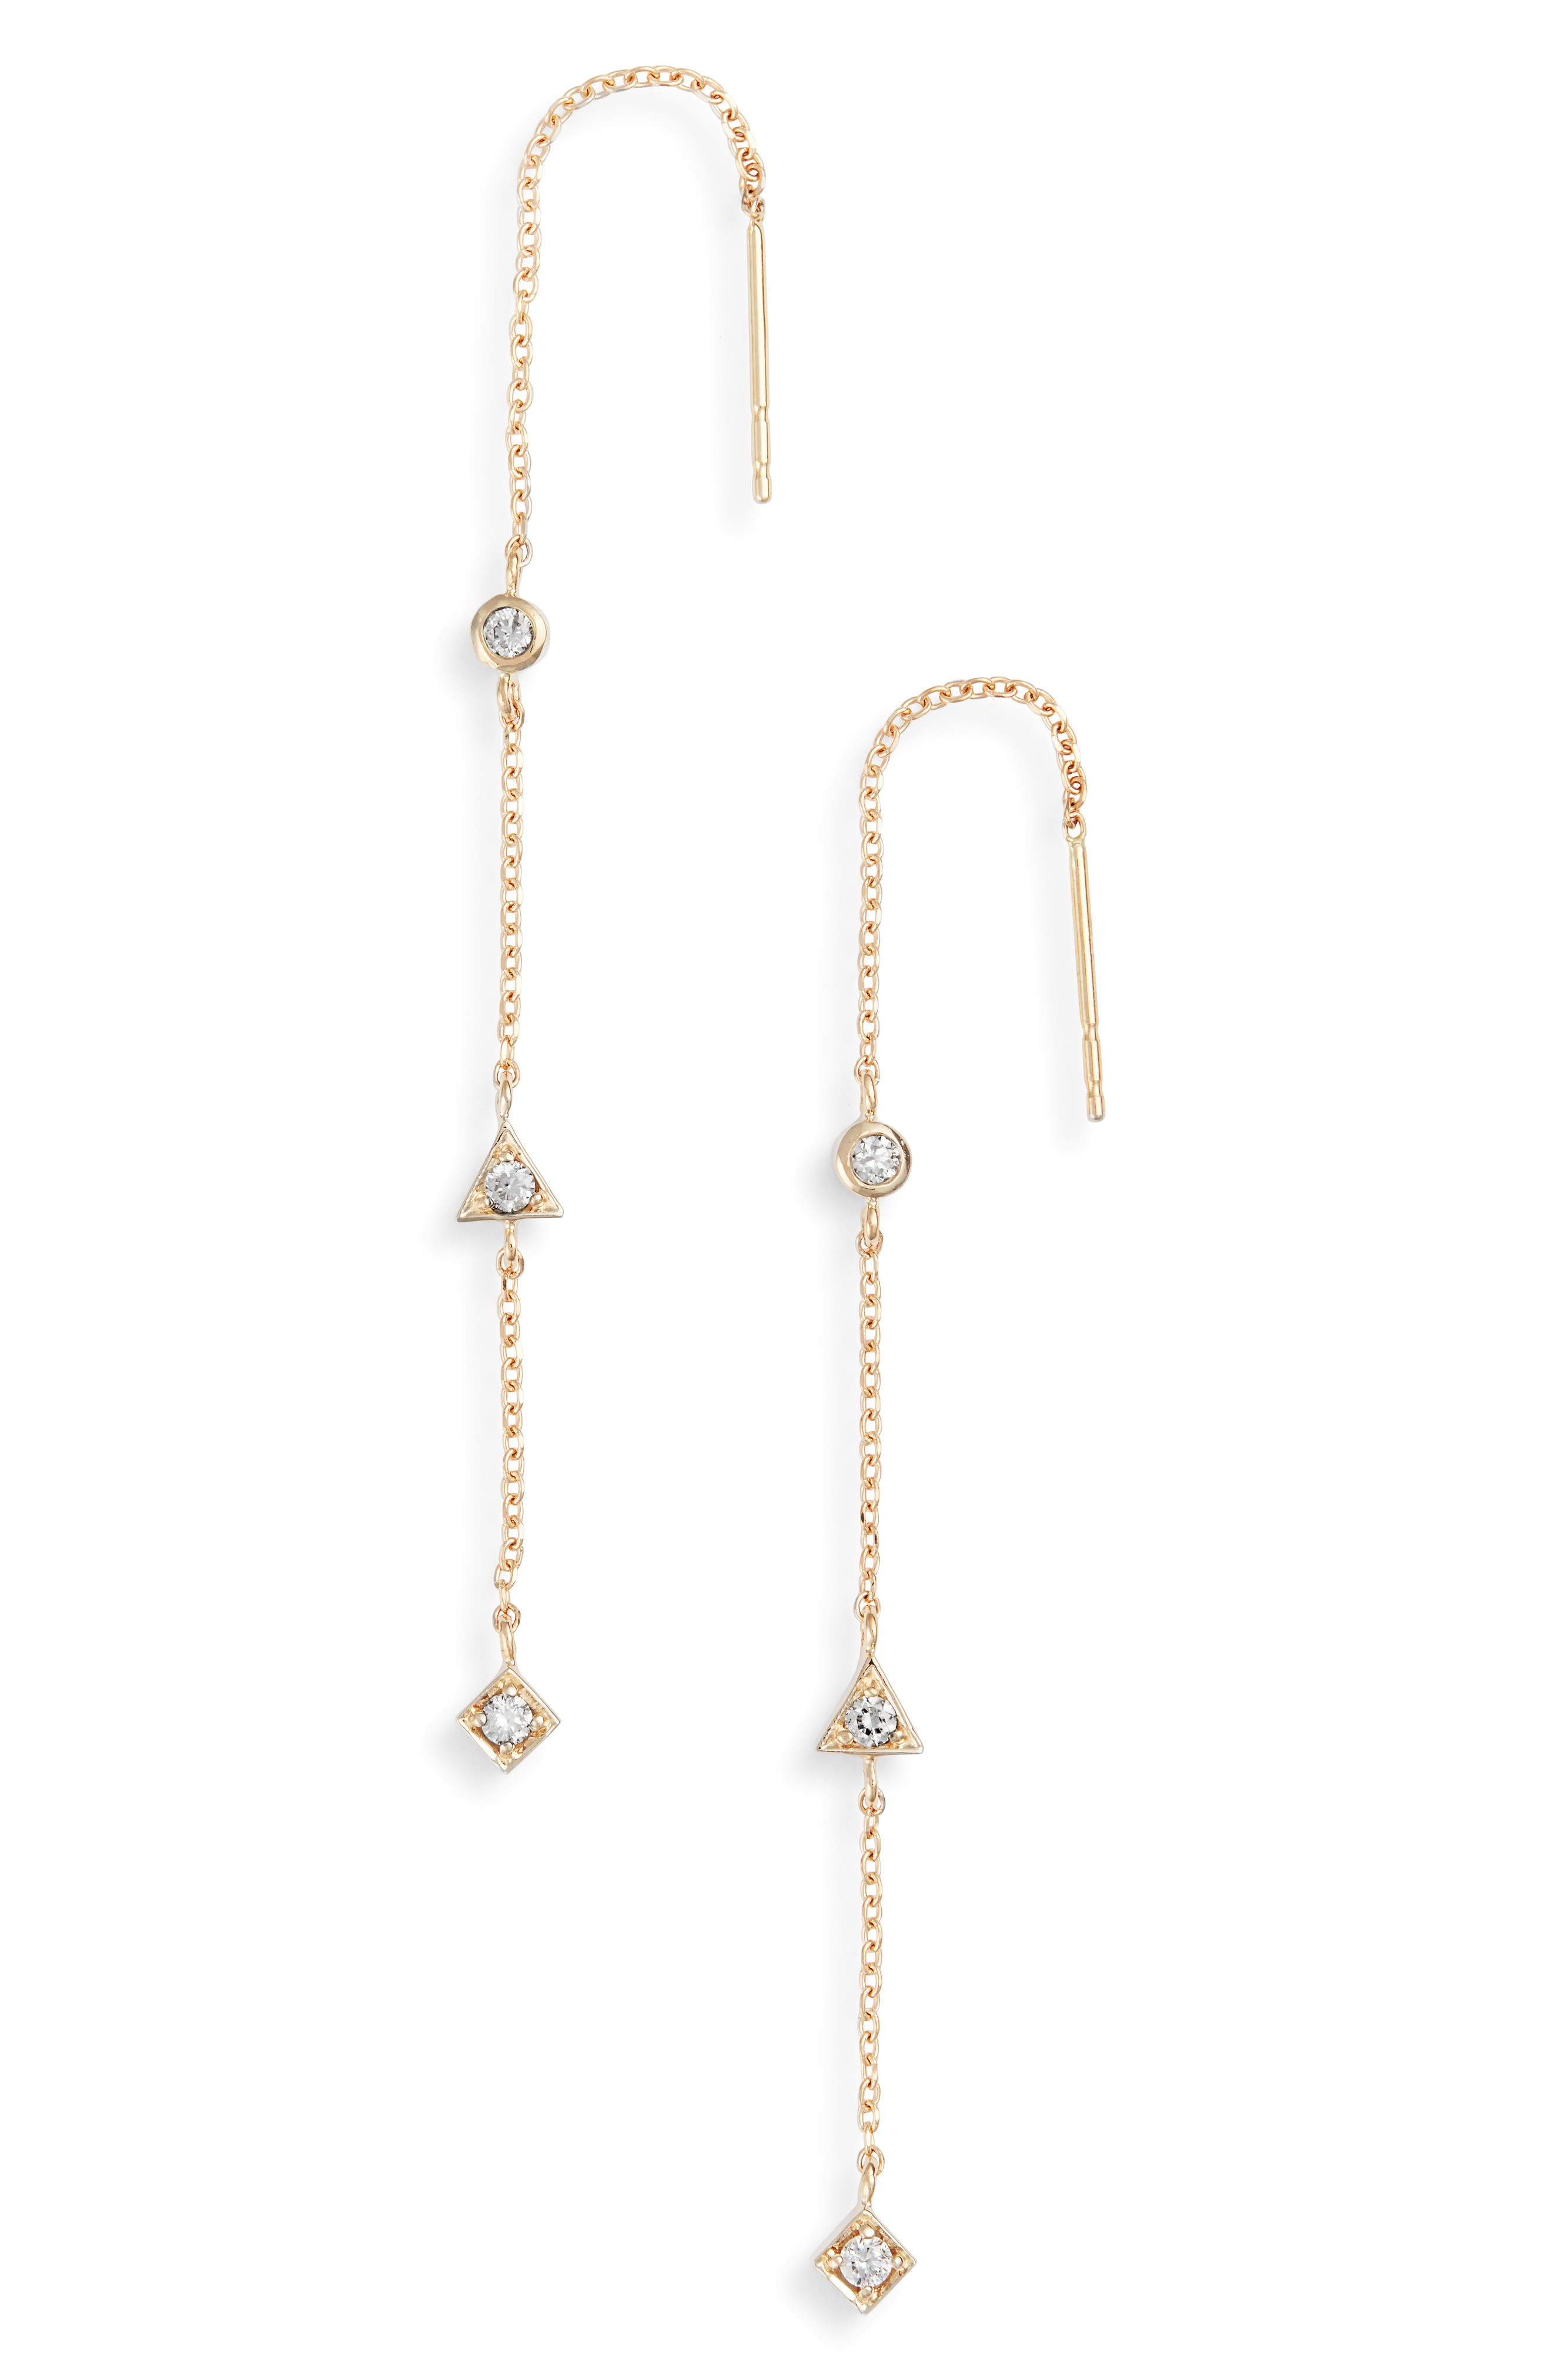 Cleo Diamond Linear Earrings,                             Main thumbnail 1, color,                             GOLD